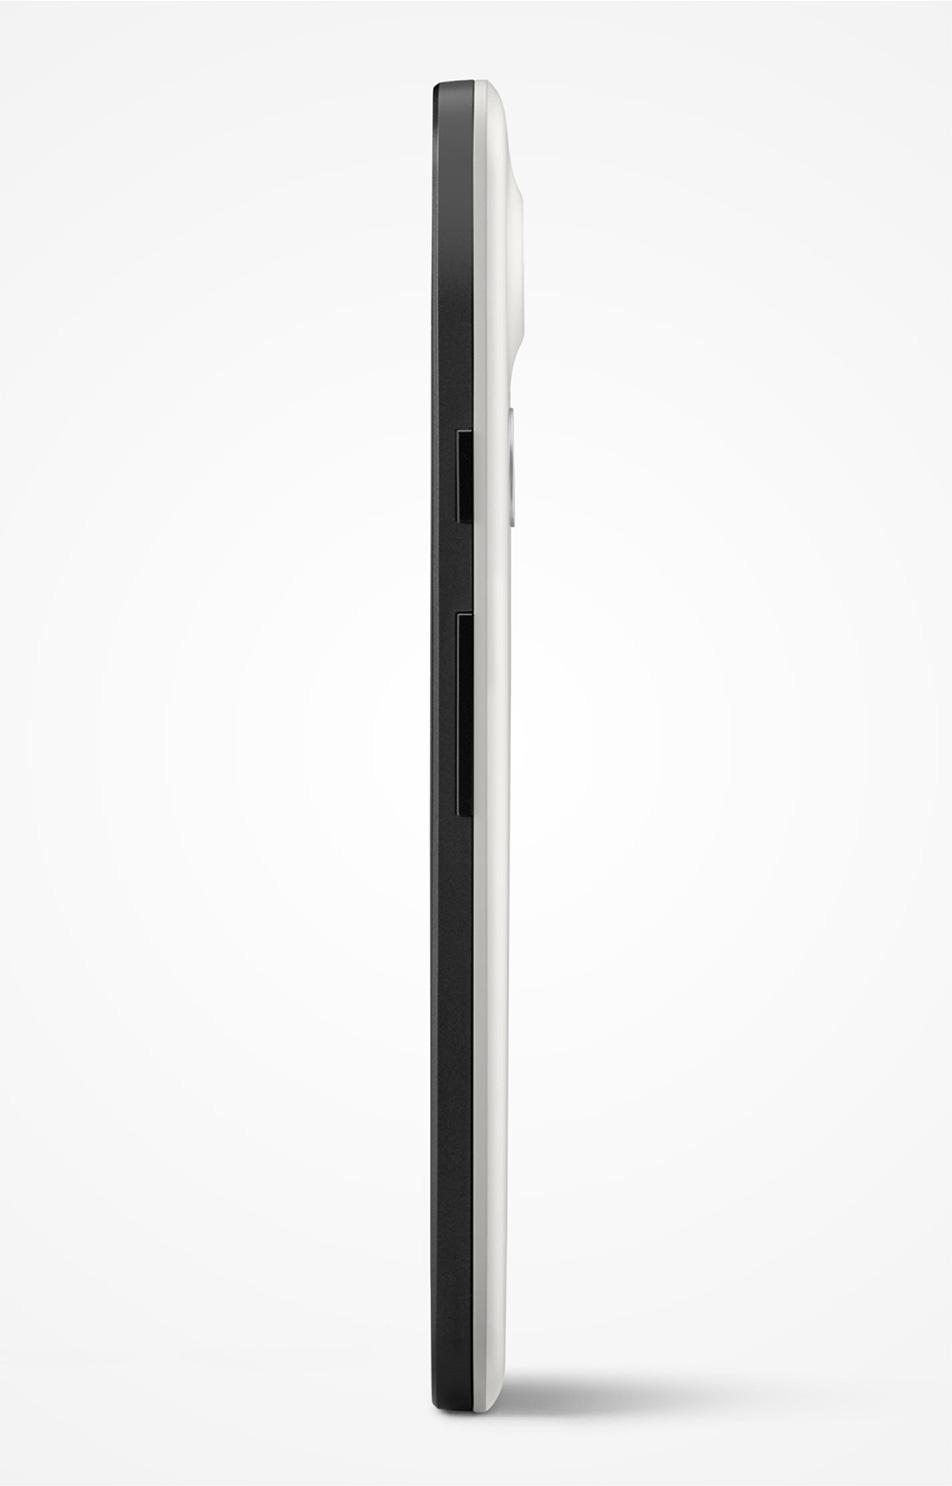 Nexus-5X side view